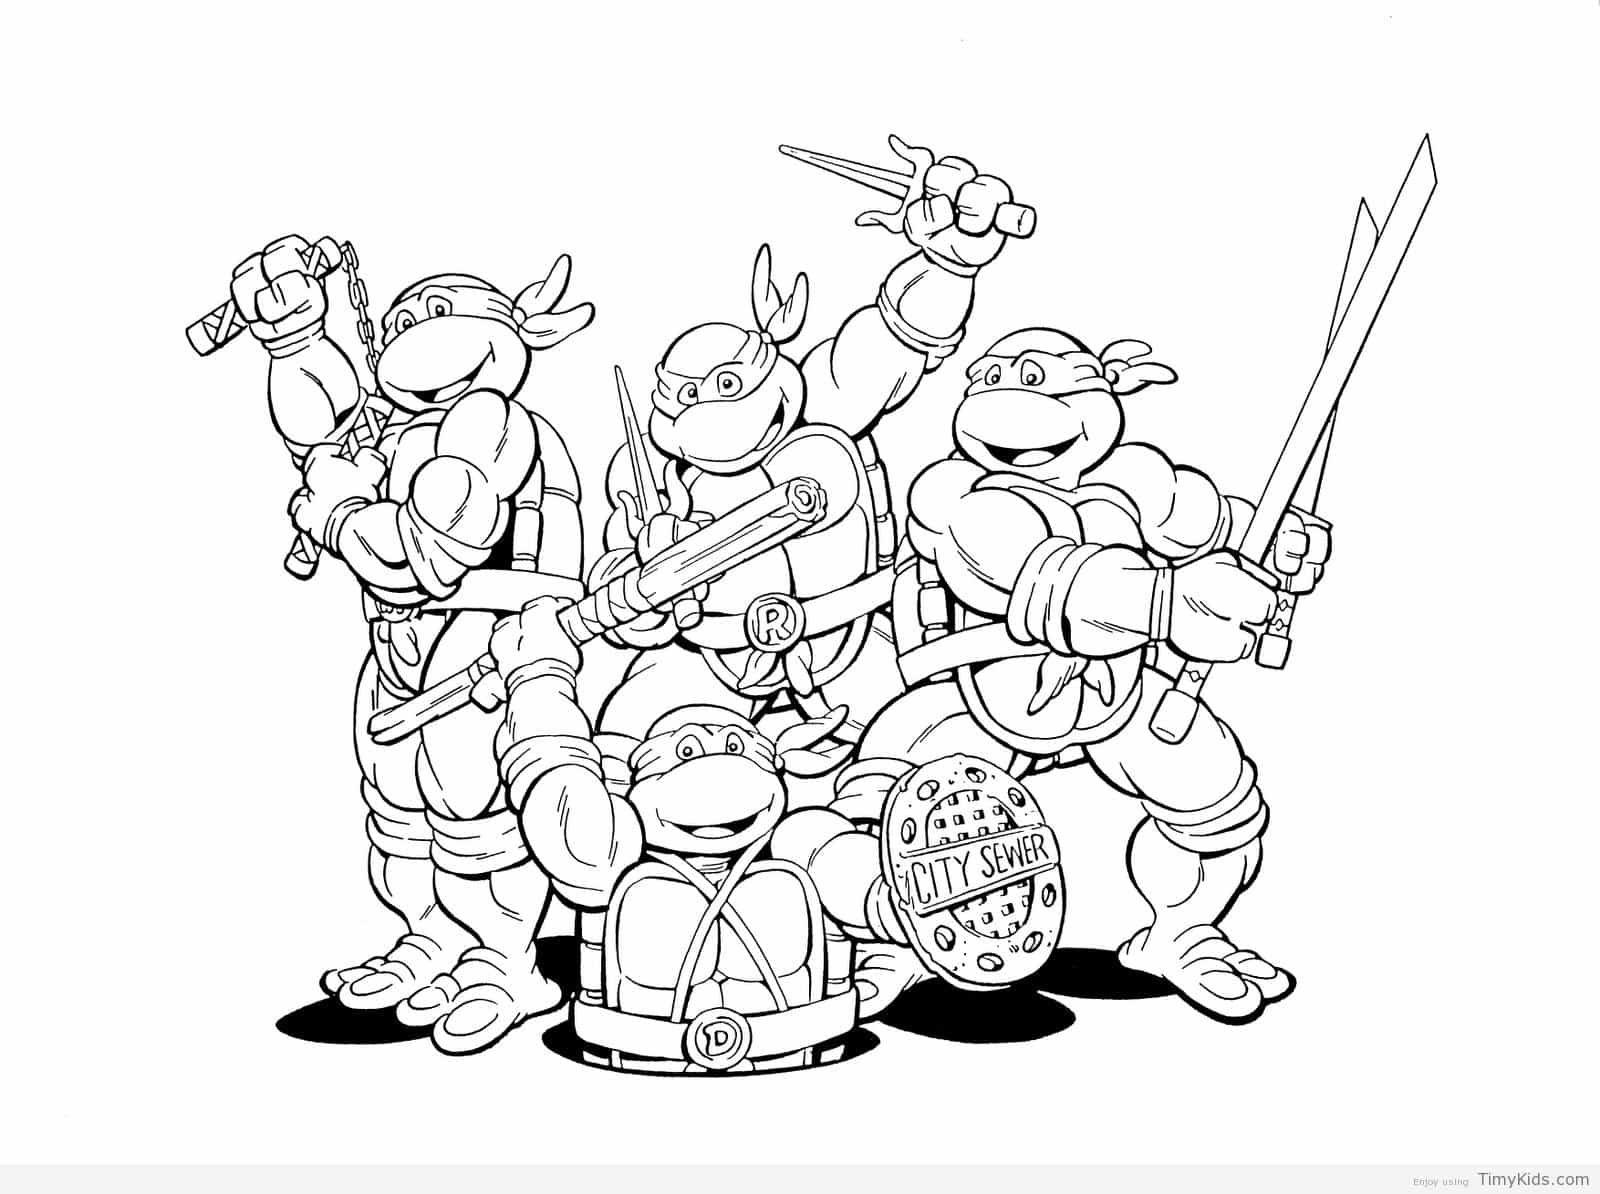 http://timykids.com/teenage-mutant-ninja-turtles-coloring-book.html ...